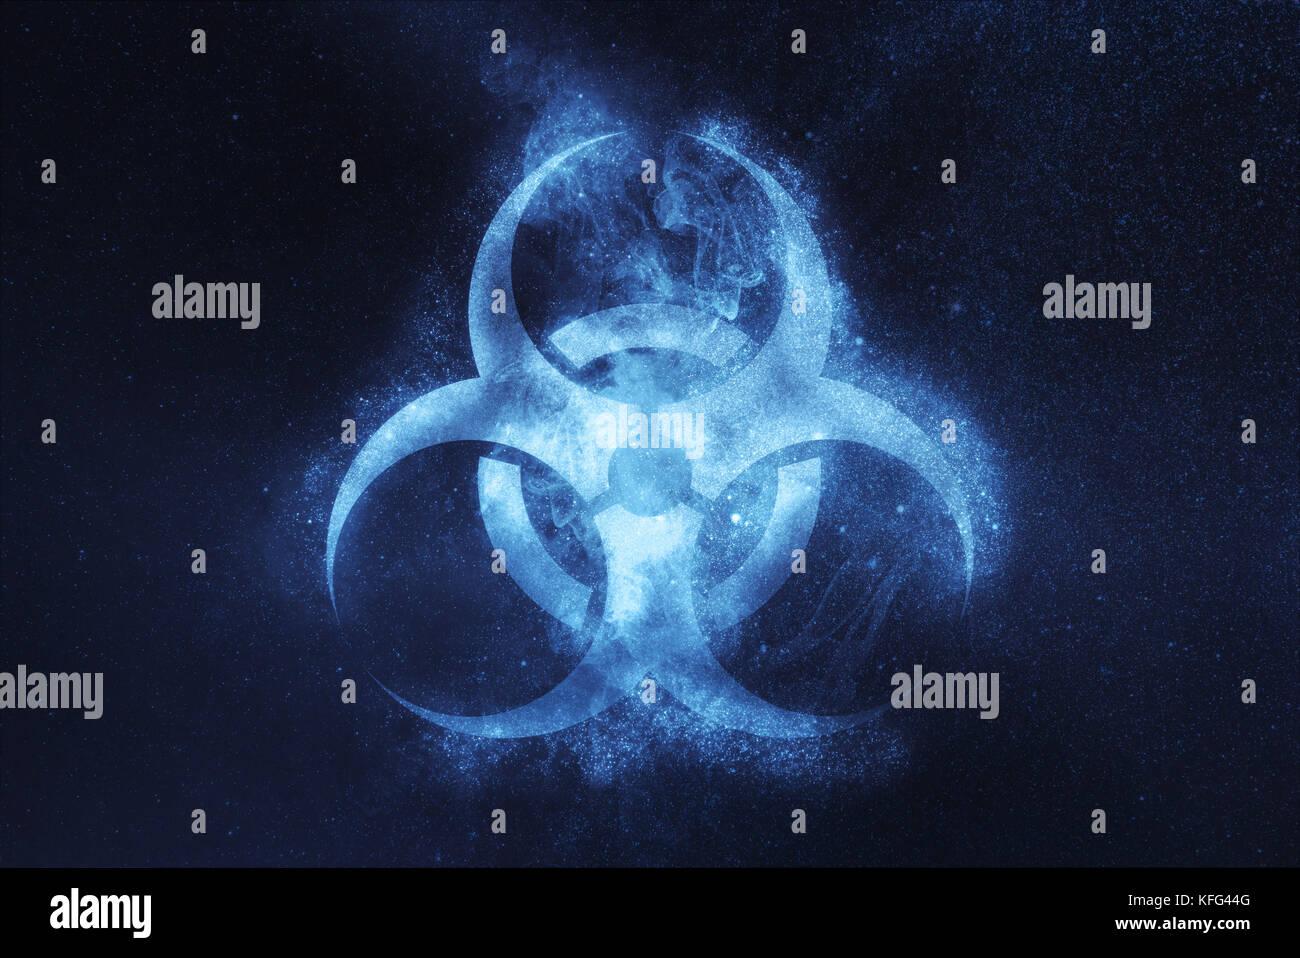 Biohazard symbol. Biohazard sign. Abstract night sky background Stock Photo